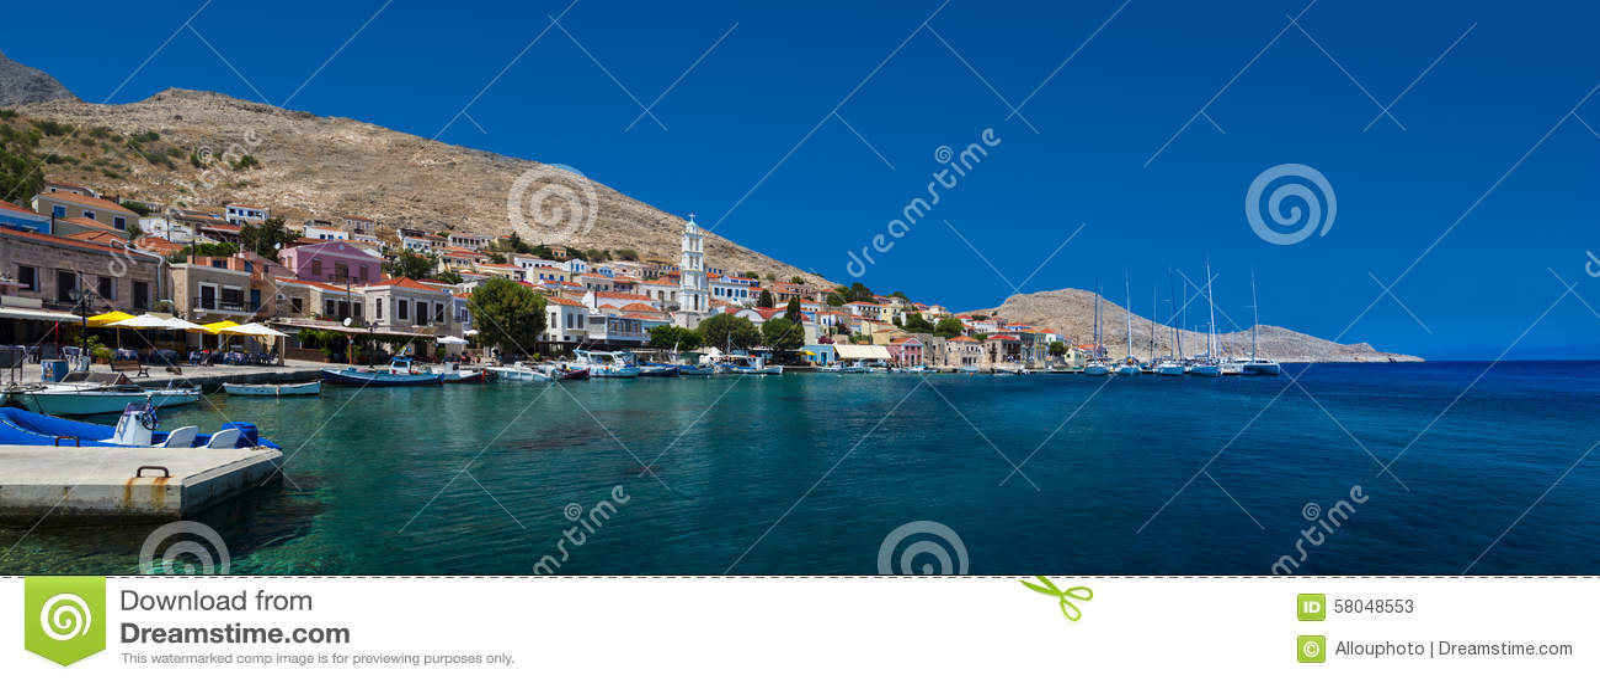 Halki Island Greece Map